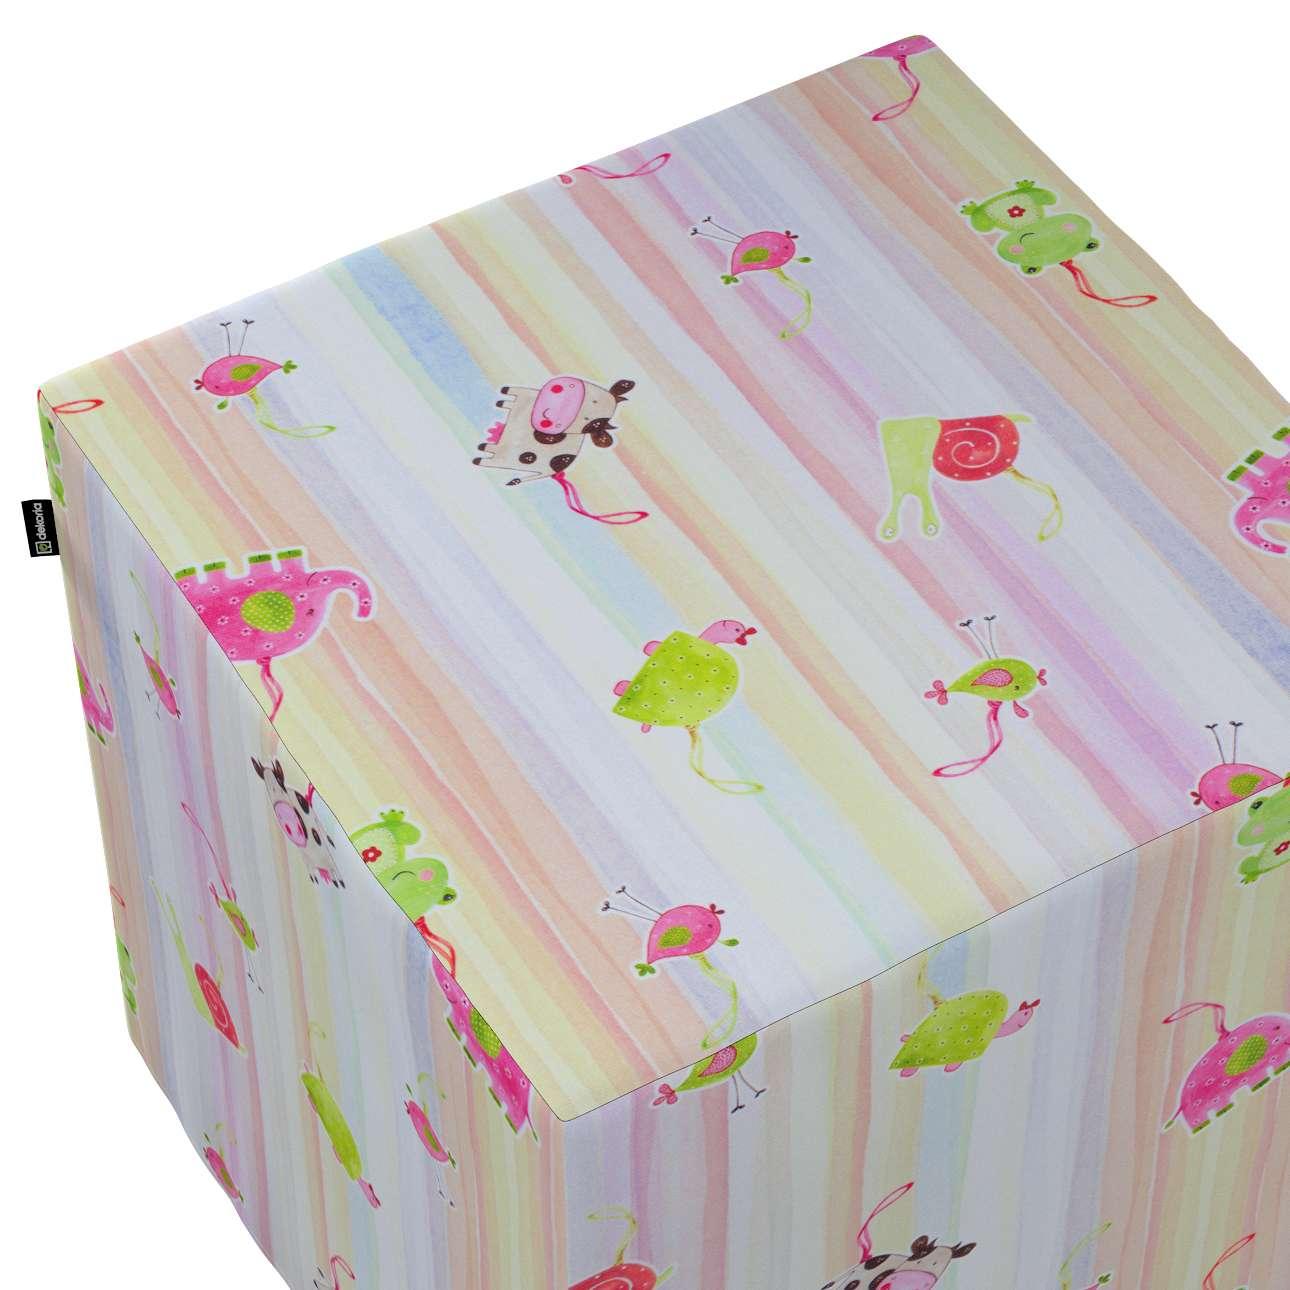 Pufa kostka w kolekcji Little World, tkanina: 151-05